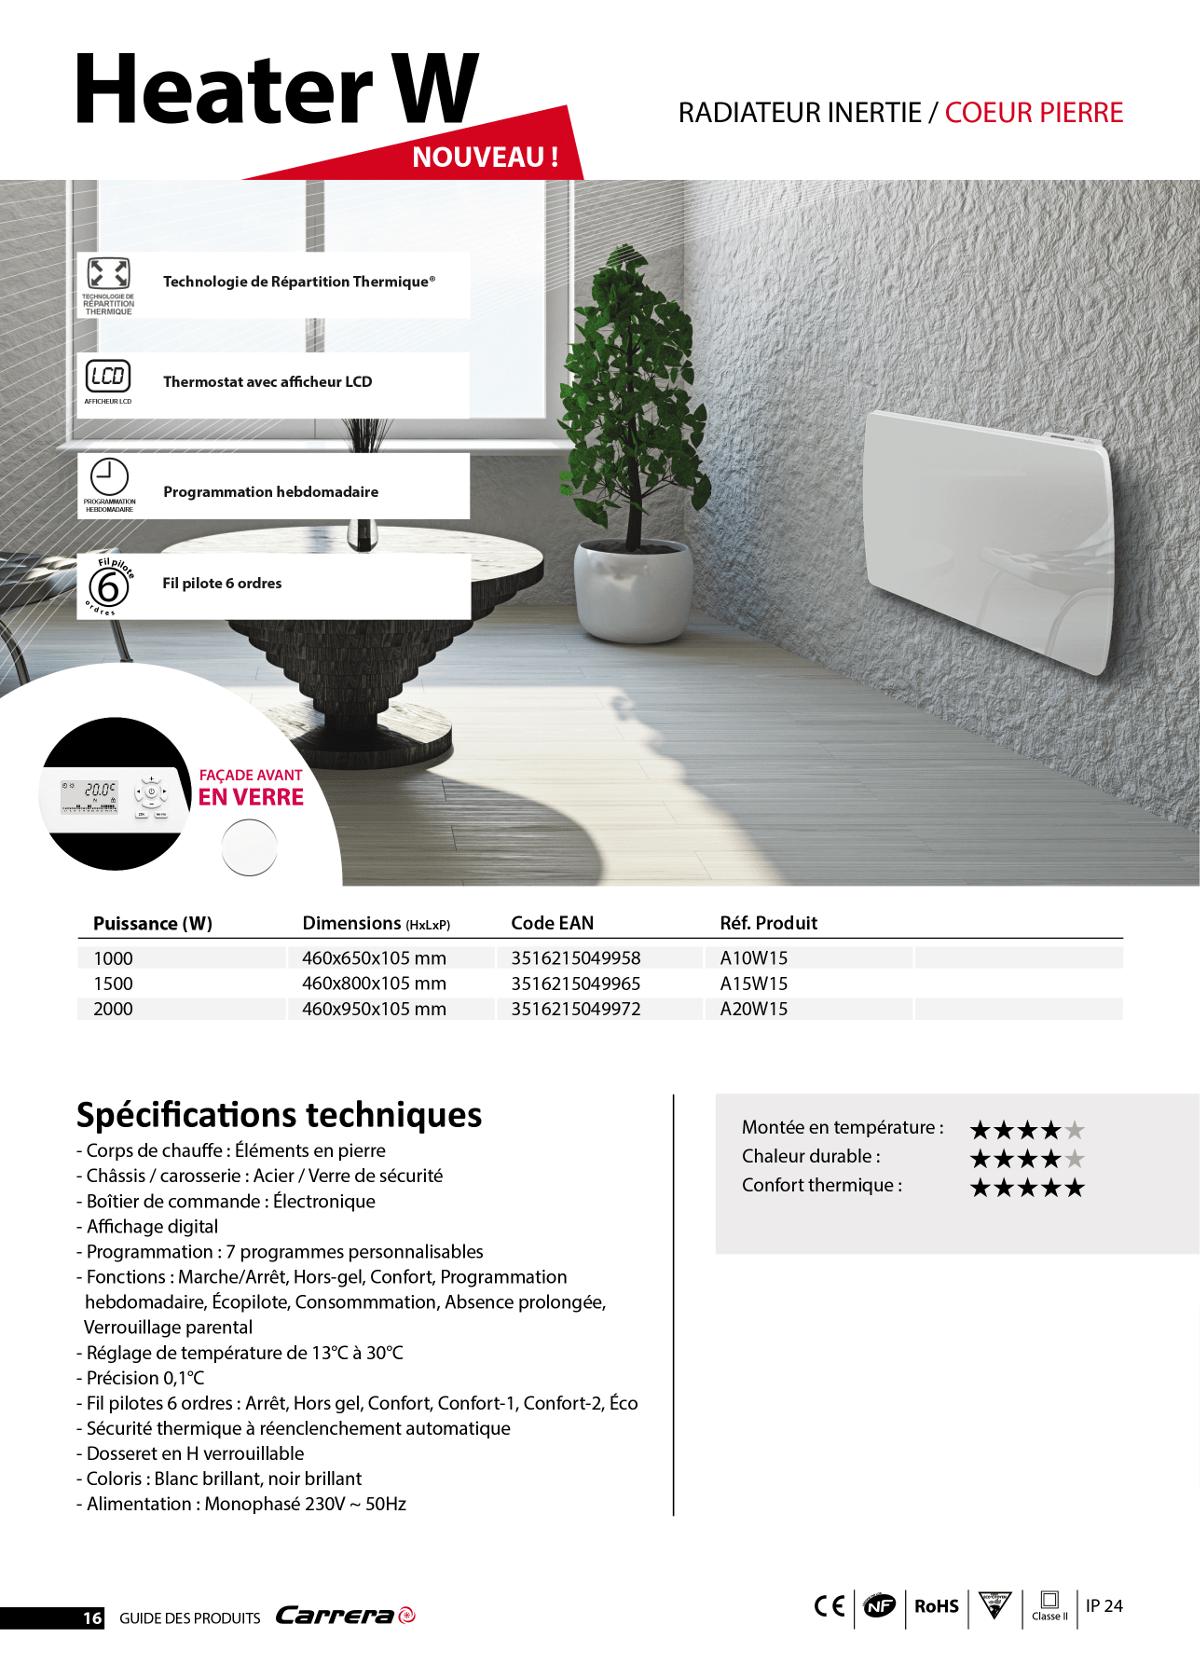 carrera jarpa 2000 watts radiateur lectrique inertie c ramique programmation lcd fa ade. Black Bedroom Furniture Sets. Home Design Ideas